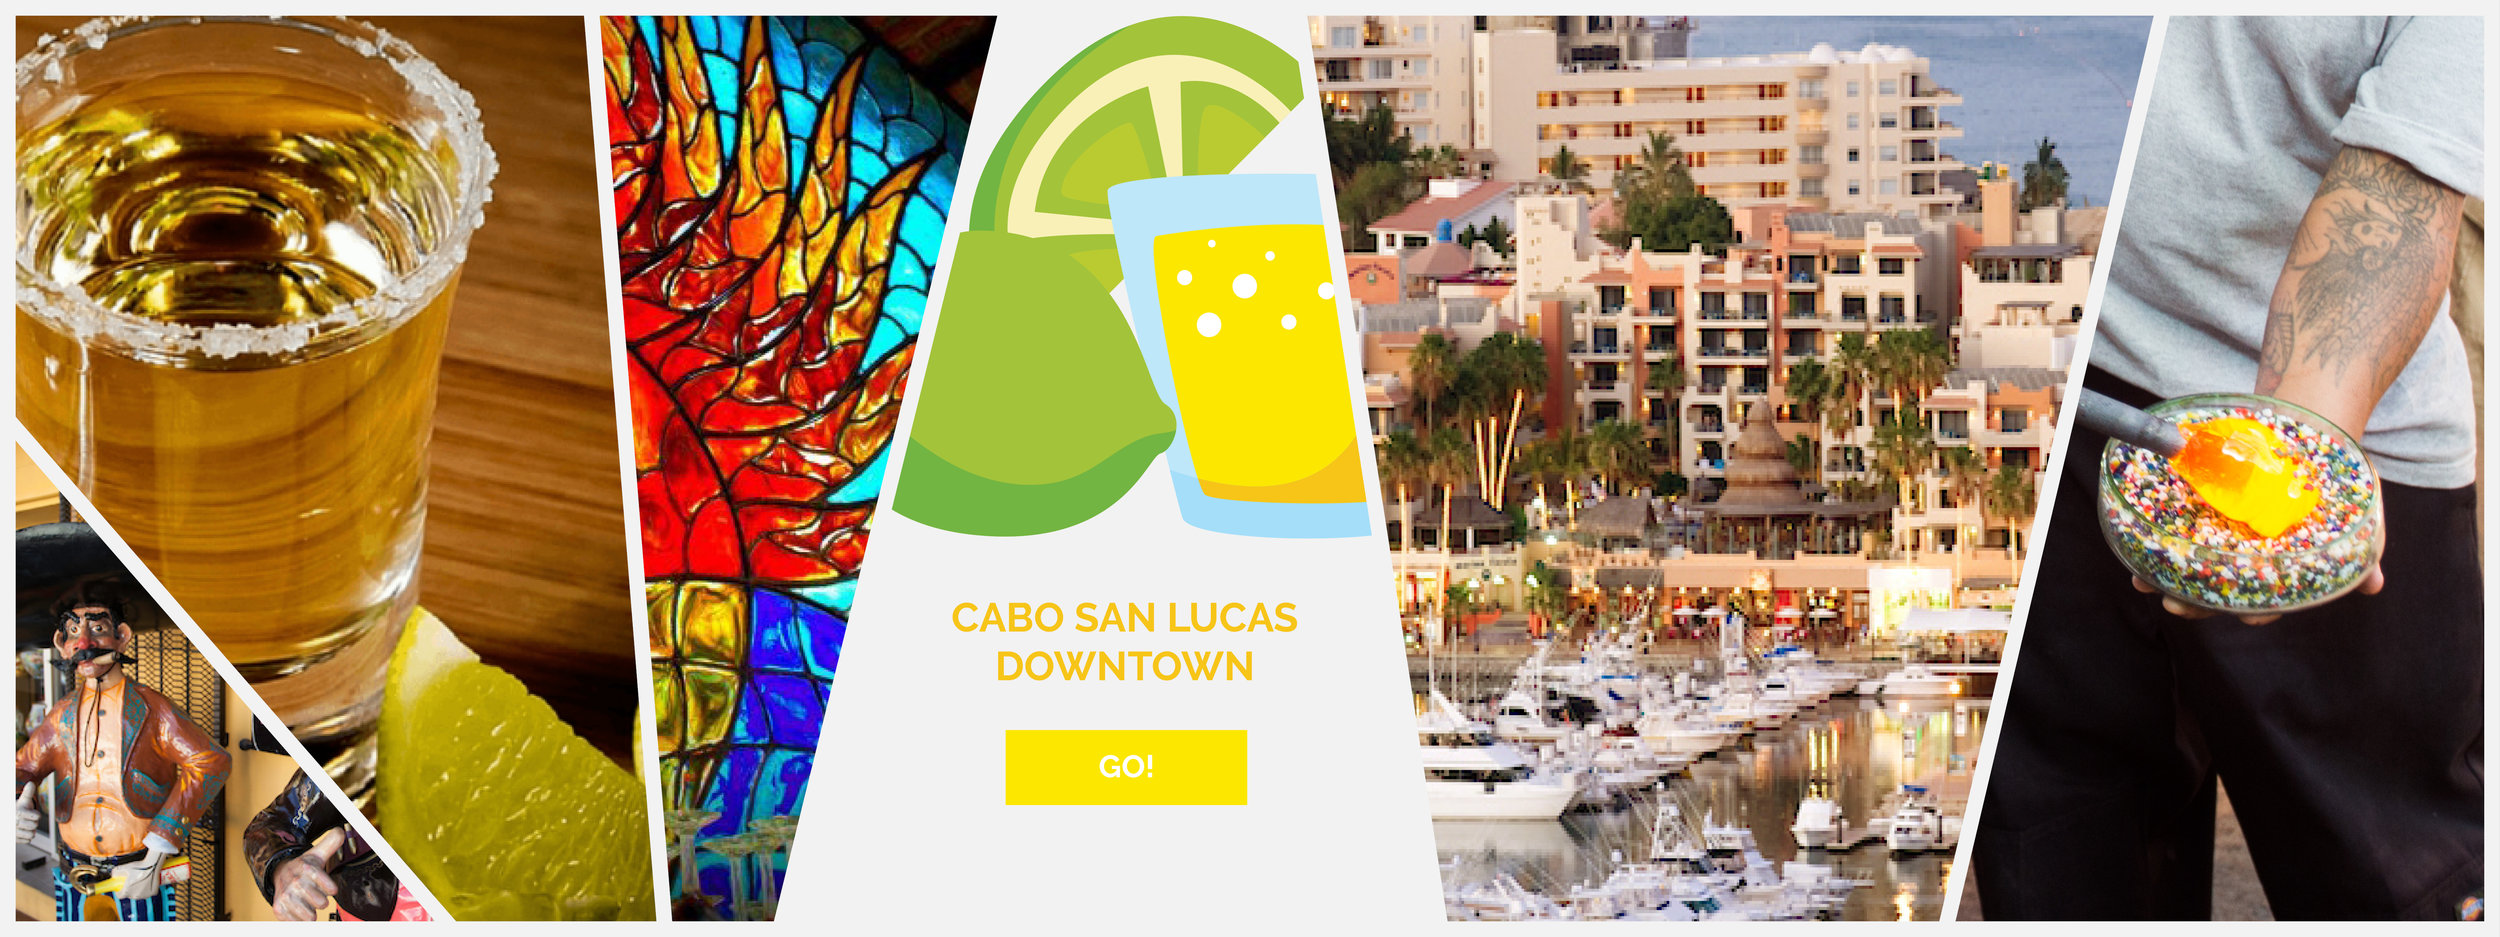 Banner_Cabo San Lucas Downtown (2).jpg